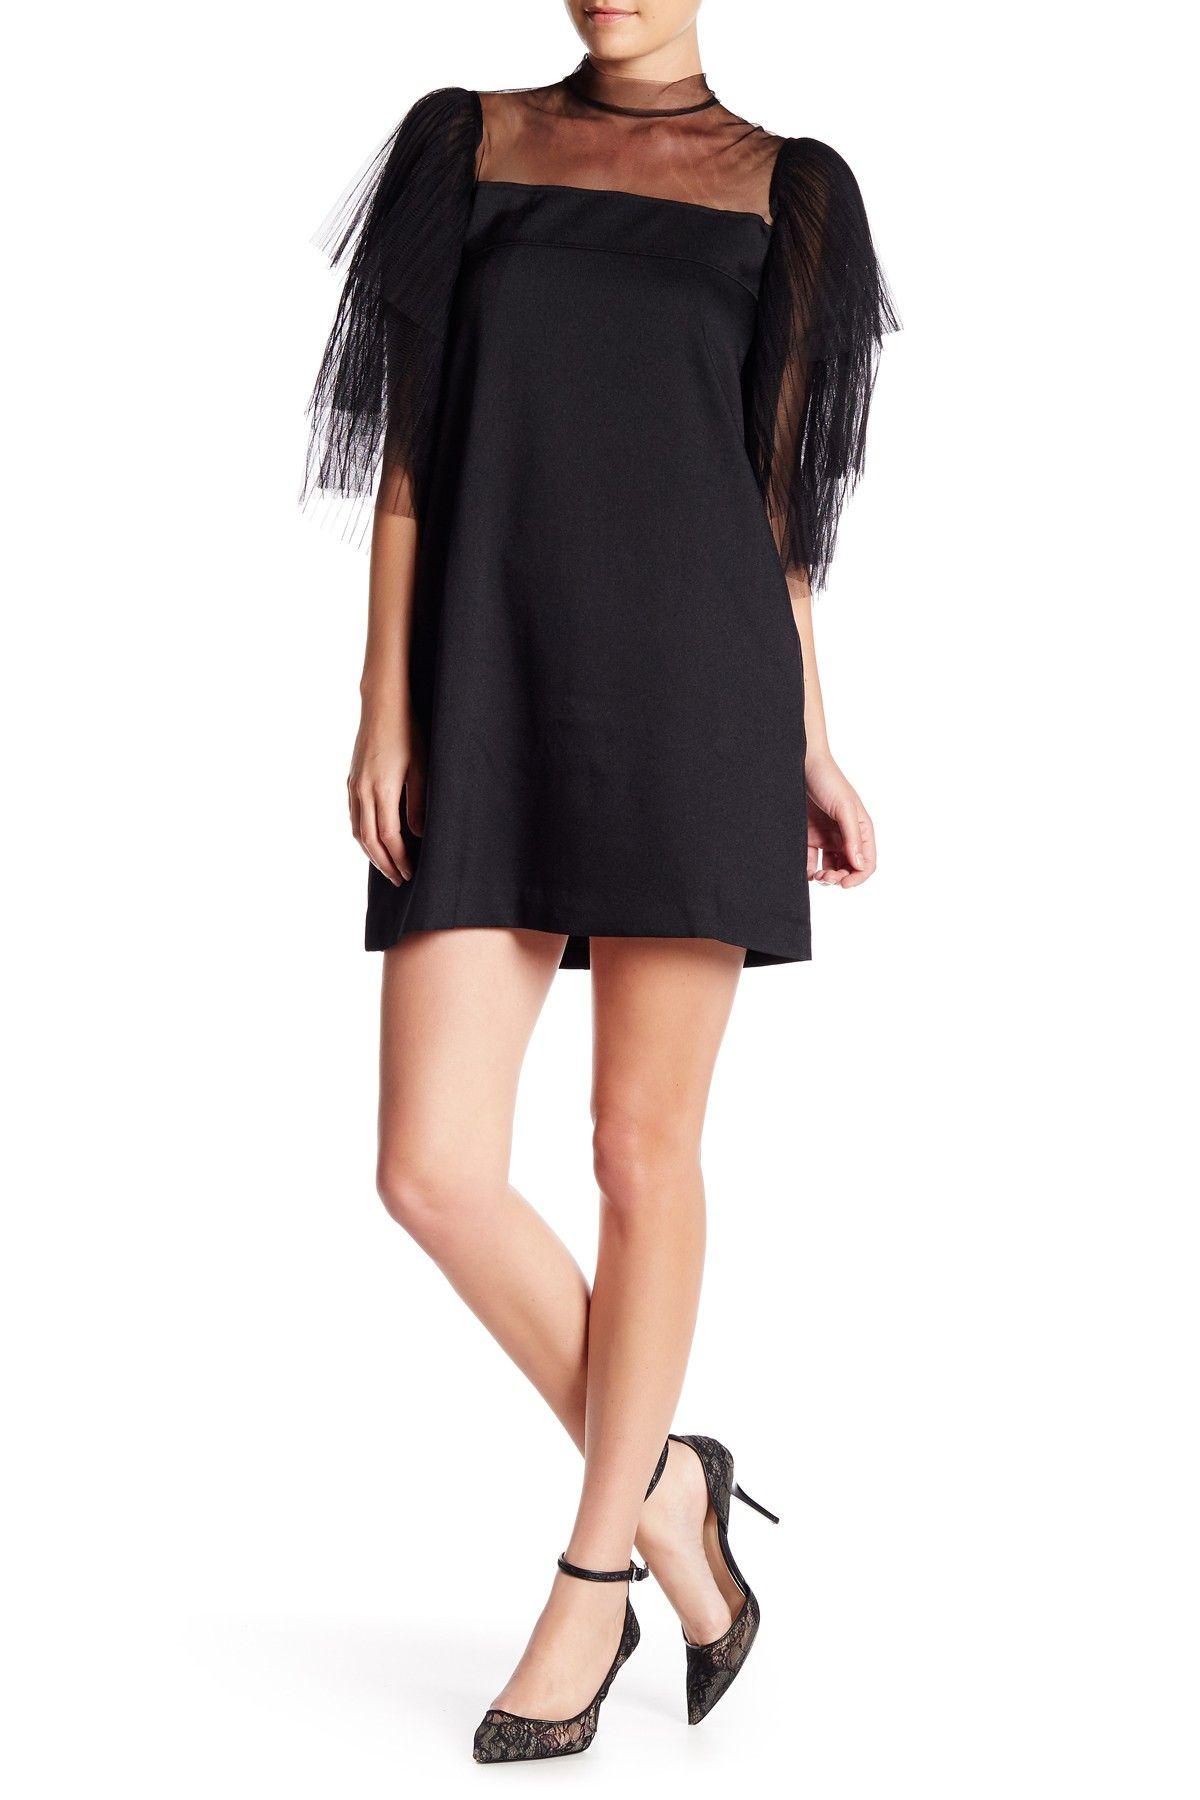 Gracia Tiered Mesh Sleeve Dress Dresses Mesh Sleeved Dress Mesh Sleeves [ 1800 x 1200 Pixel ]